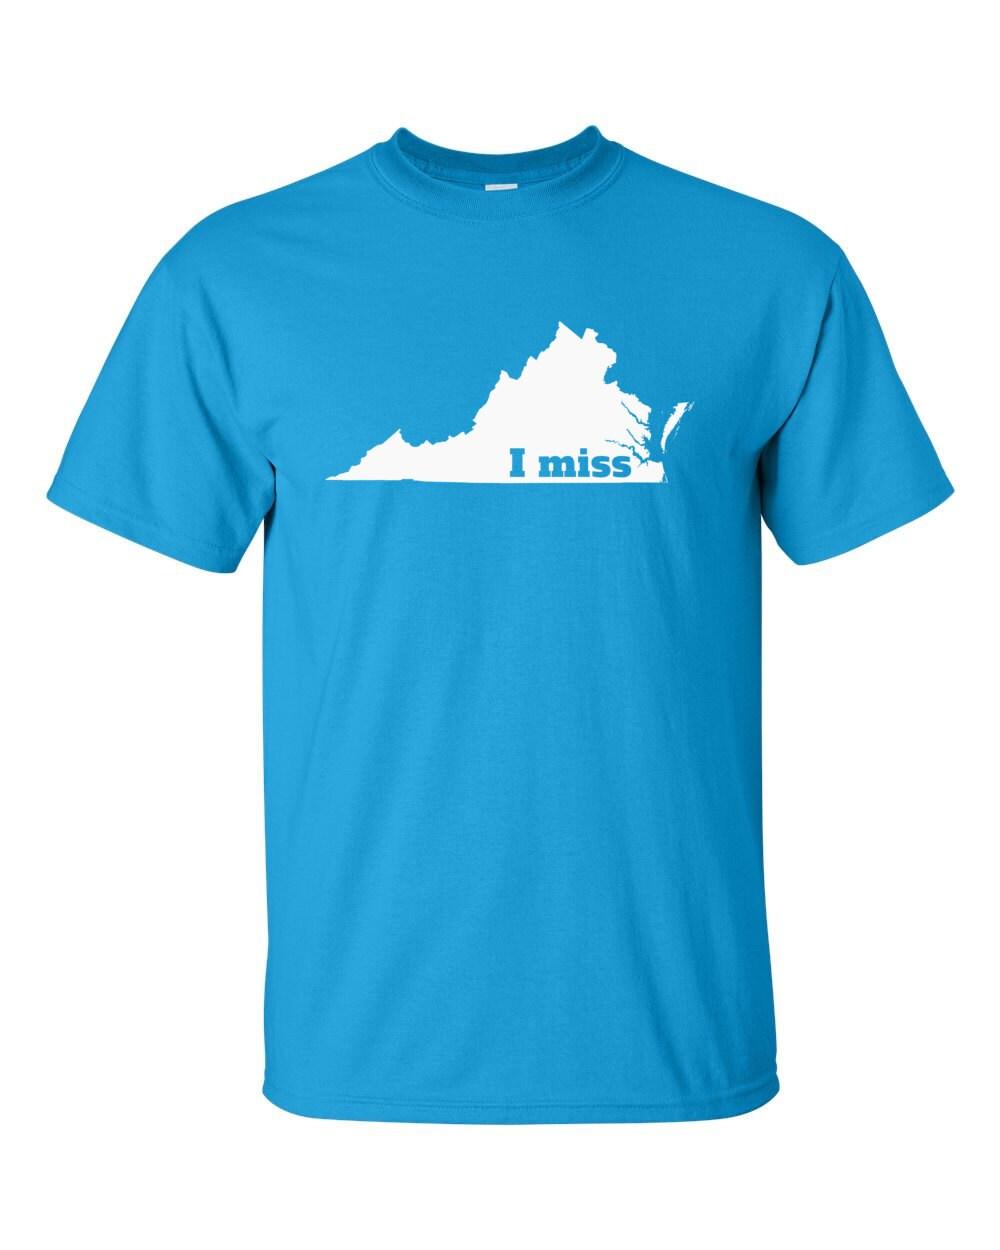 Virginia T-shirt - I Miss Virginia - My State Virginia T-shirt